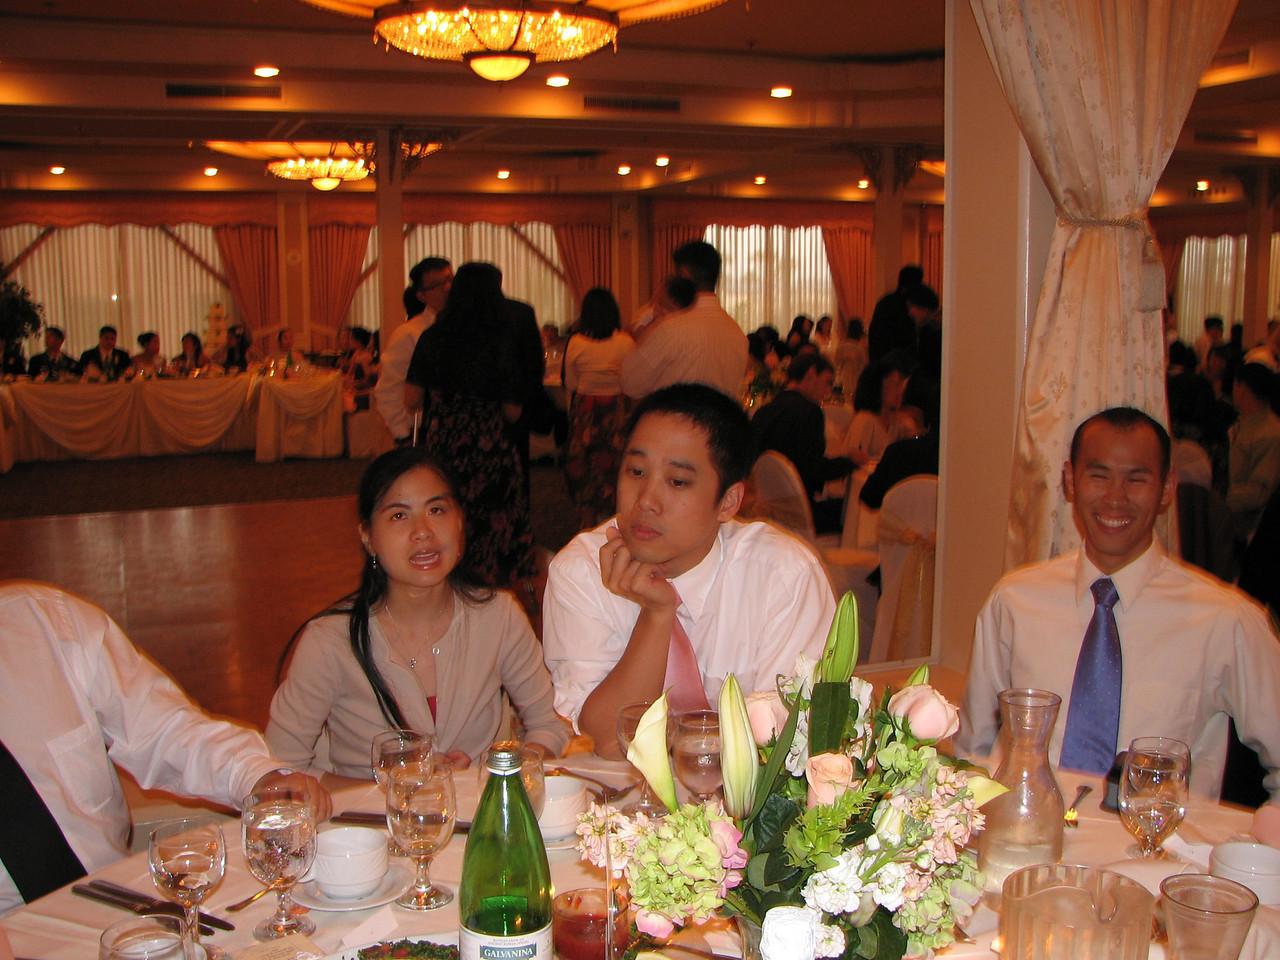 2007 06 09 Sat - Audrey & Andy Wu, and Steve Hu